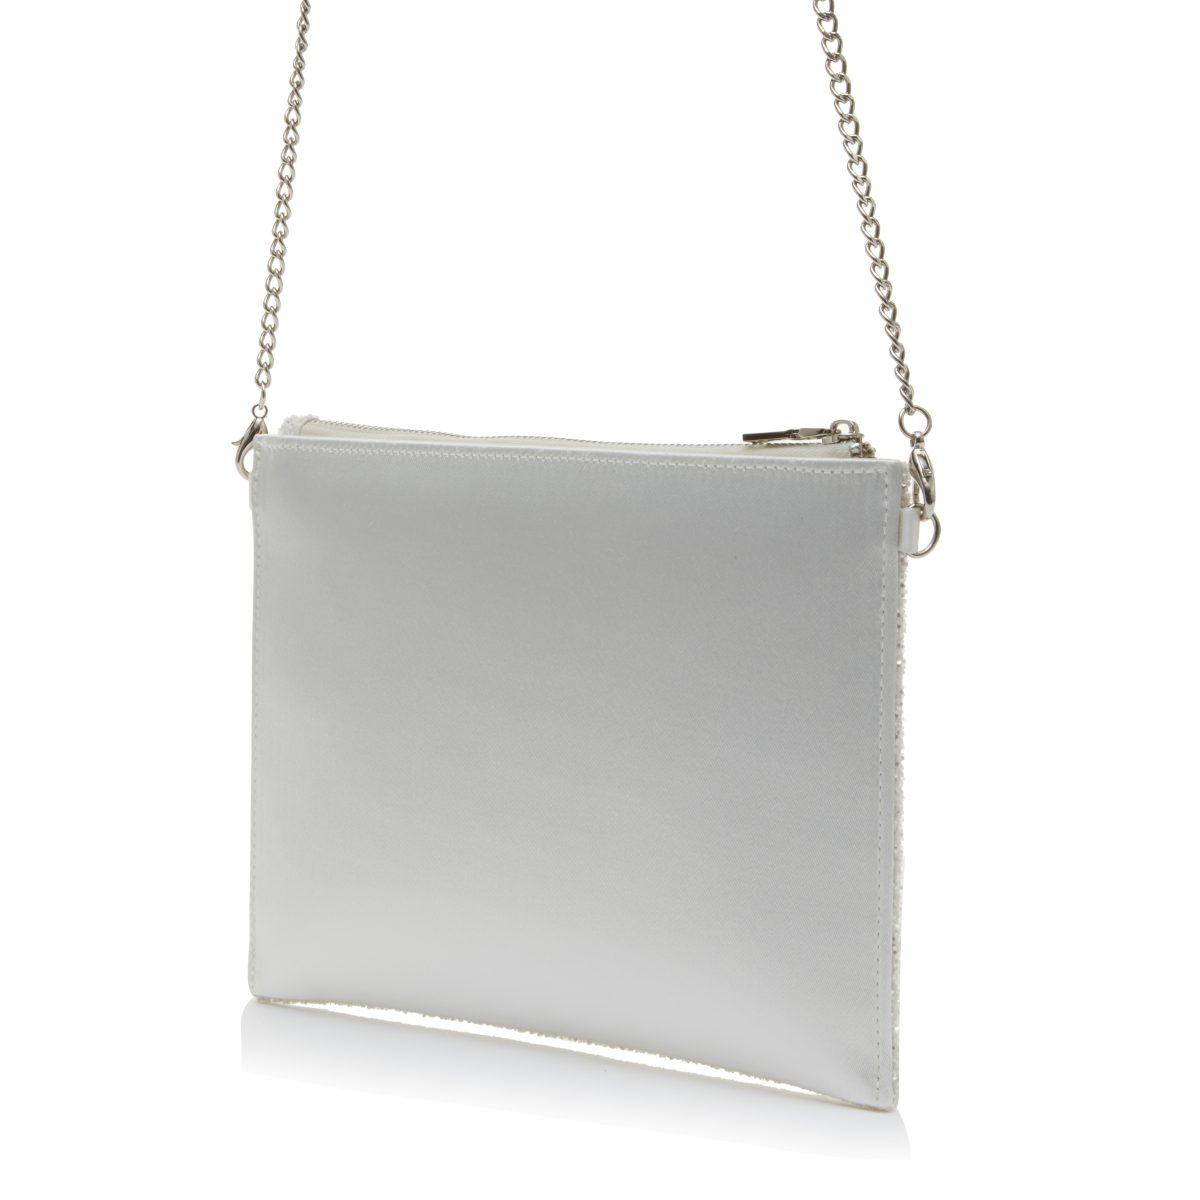 Rainbow Club Arizona Handbag 3